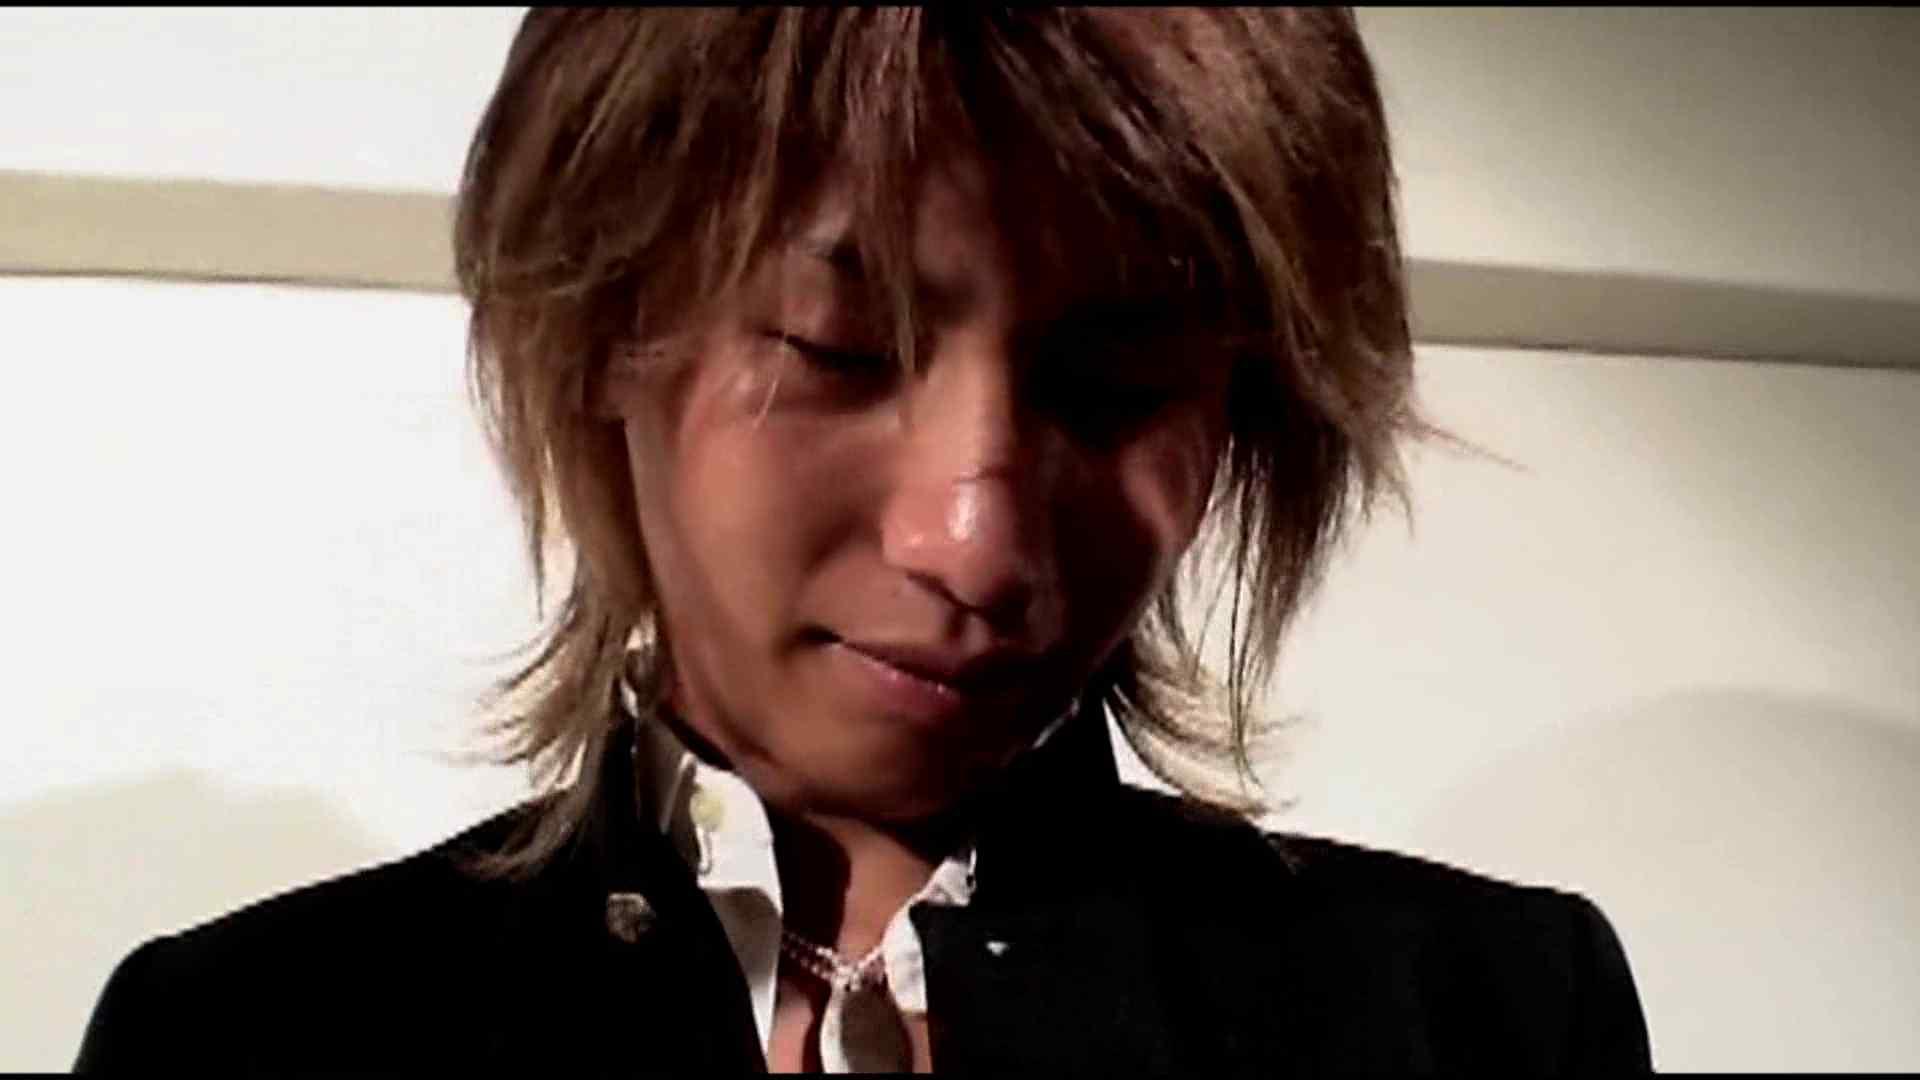 (HDバージョン)俺、チャラ男じゃないっす。違うっす...。VOL.01 男天国 | オナニー特集  88pic 3